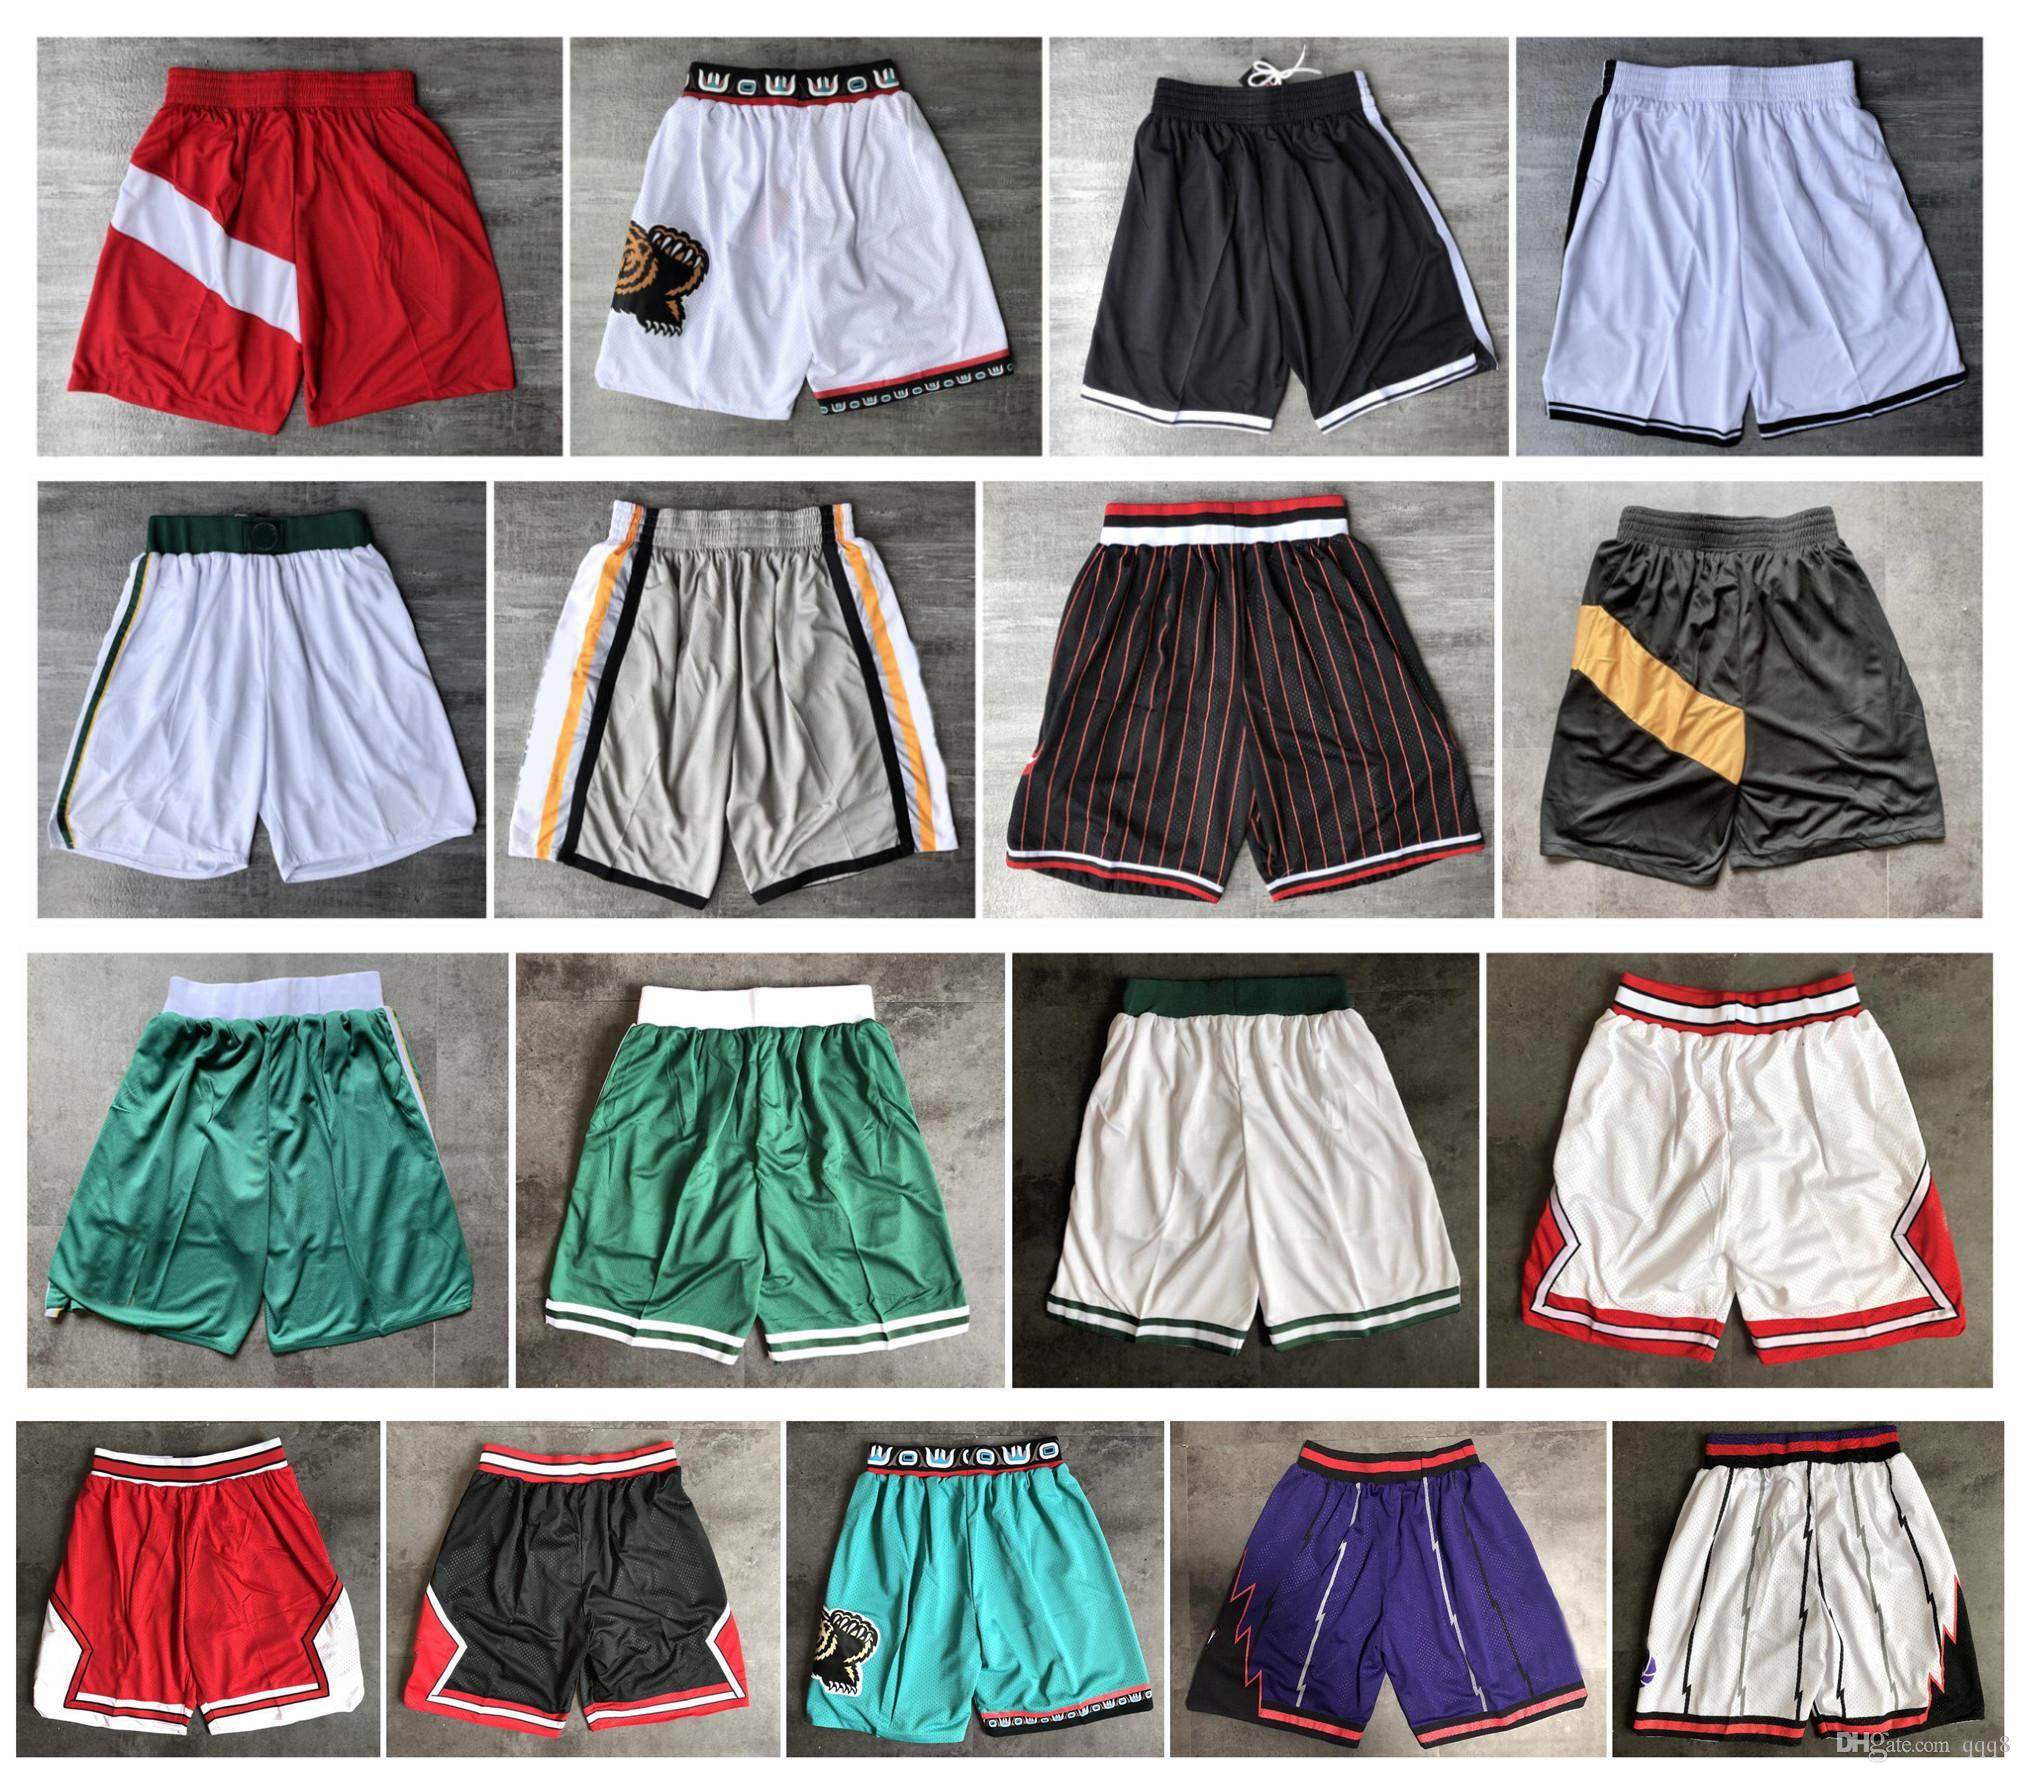 Top Qualität ! 2019 Team Basketball Shorts Men Shorts pantaloncini da basket Sport Shorts College Pants Weiß Schwarz Rot Lila Grün